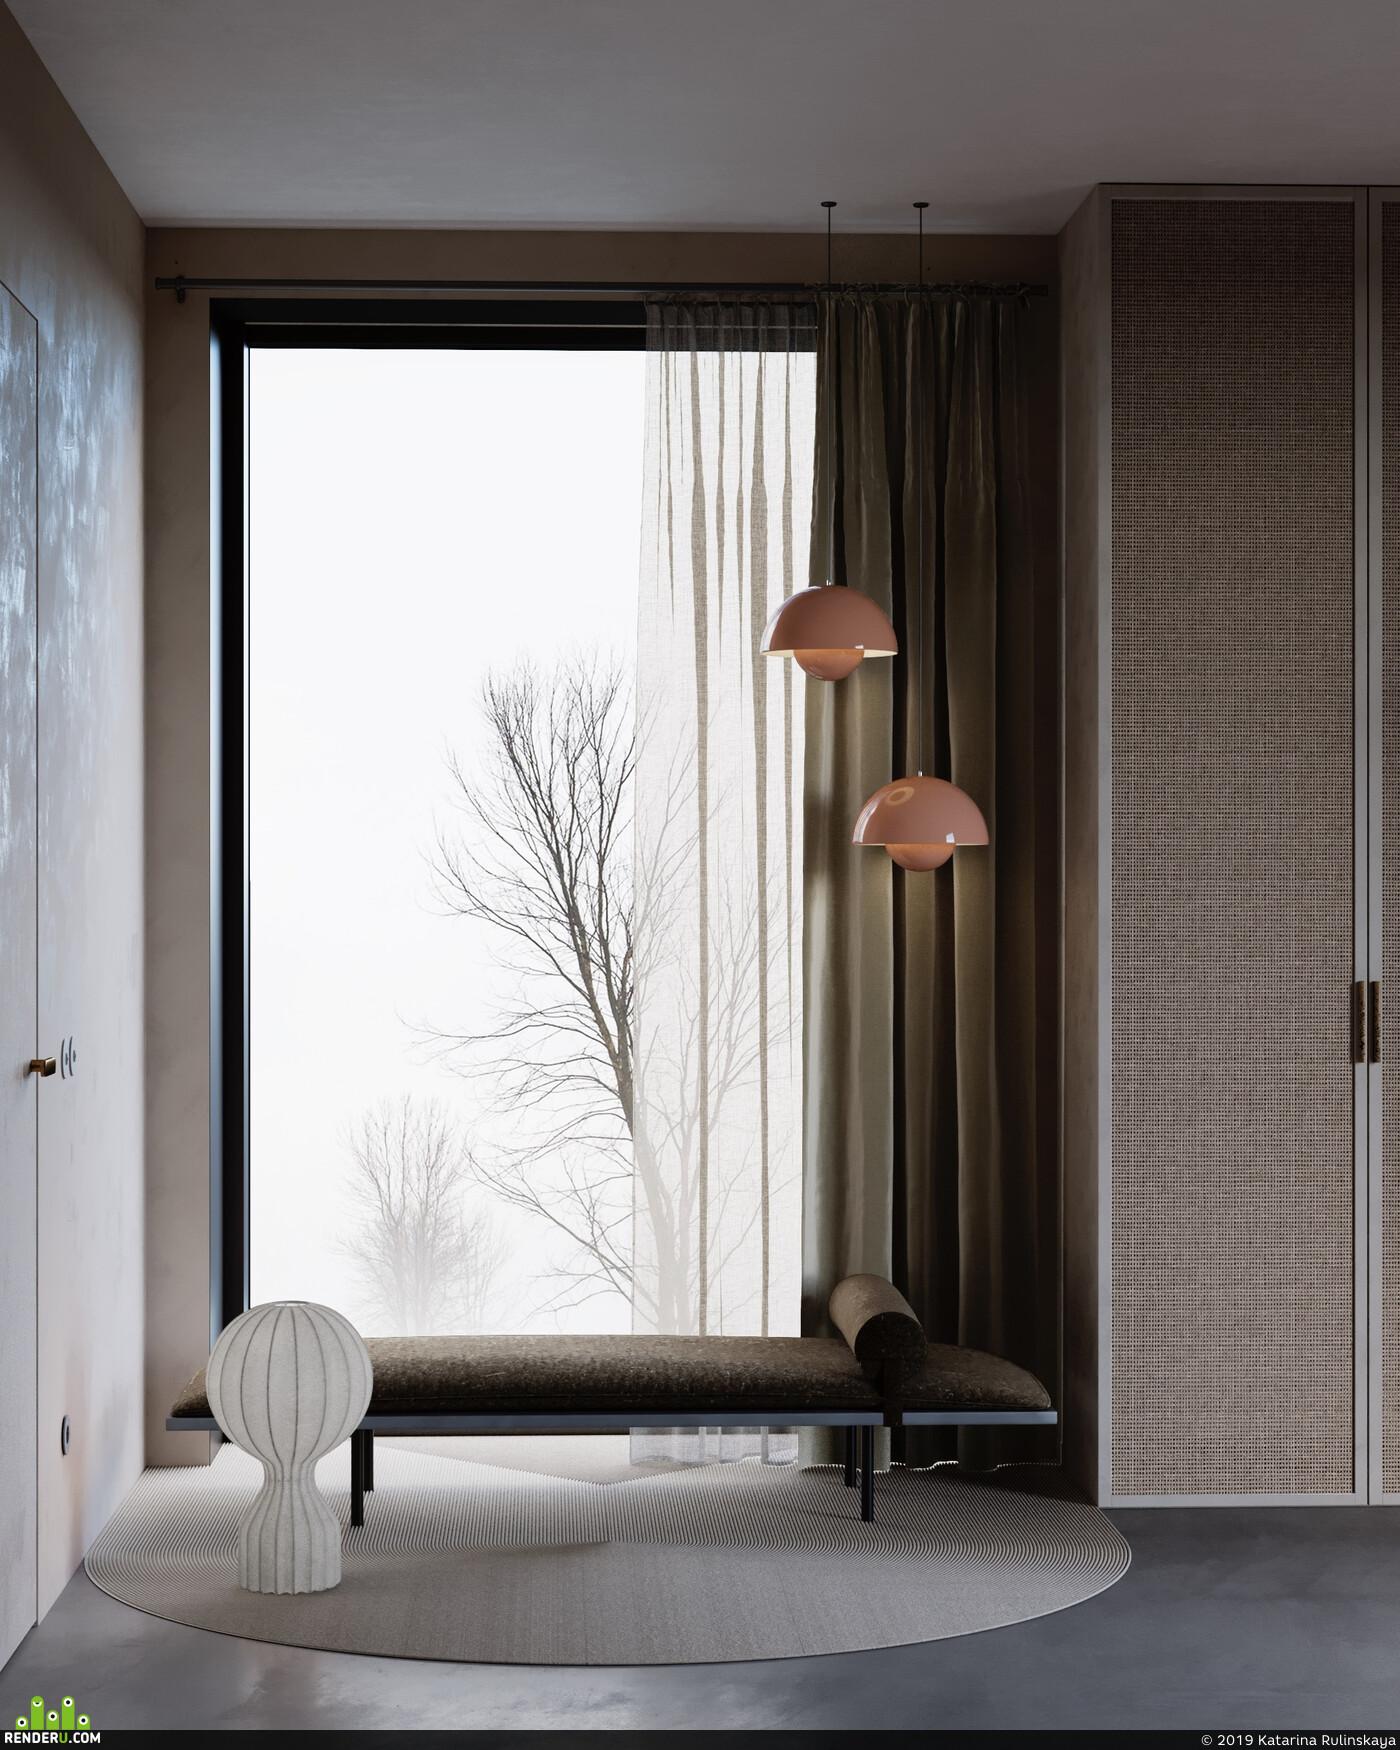 дерево, бетон, атмосфера, интерьер, зима, свет